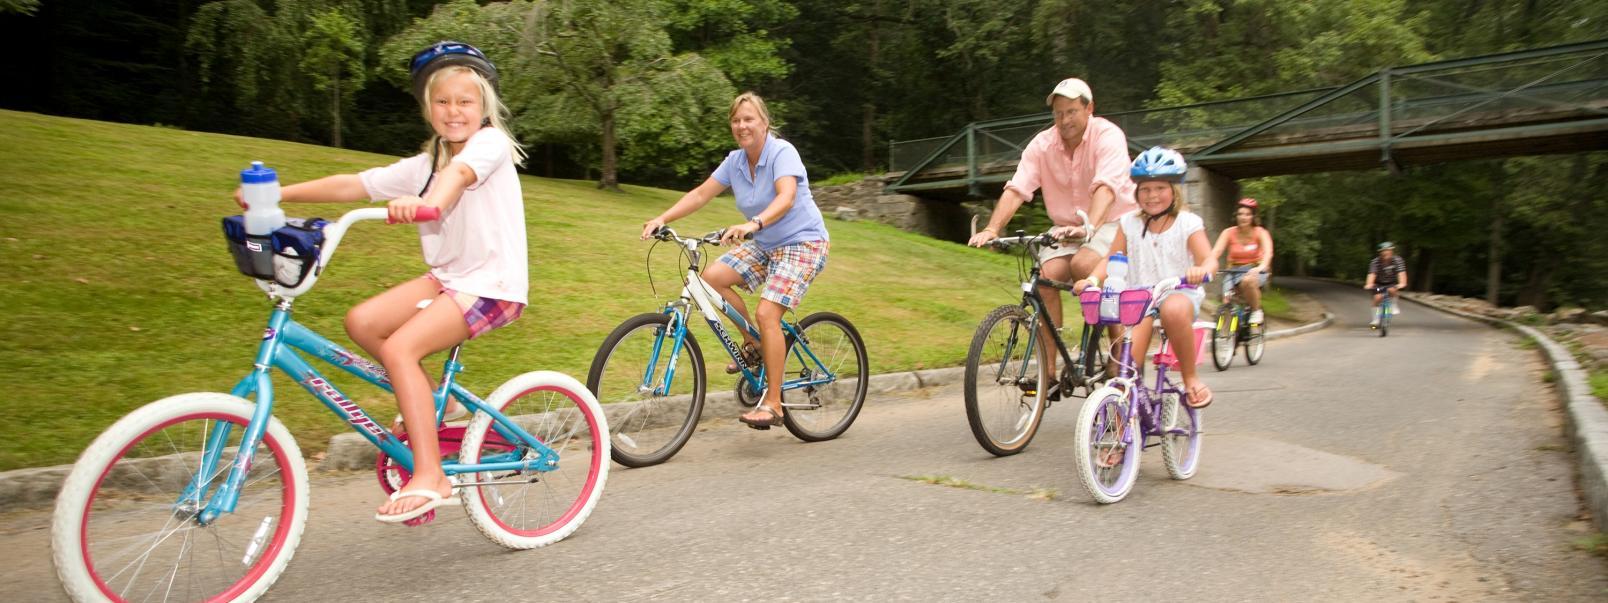 Family Friendly Fun In Wilmington De The Brandywine Valley